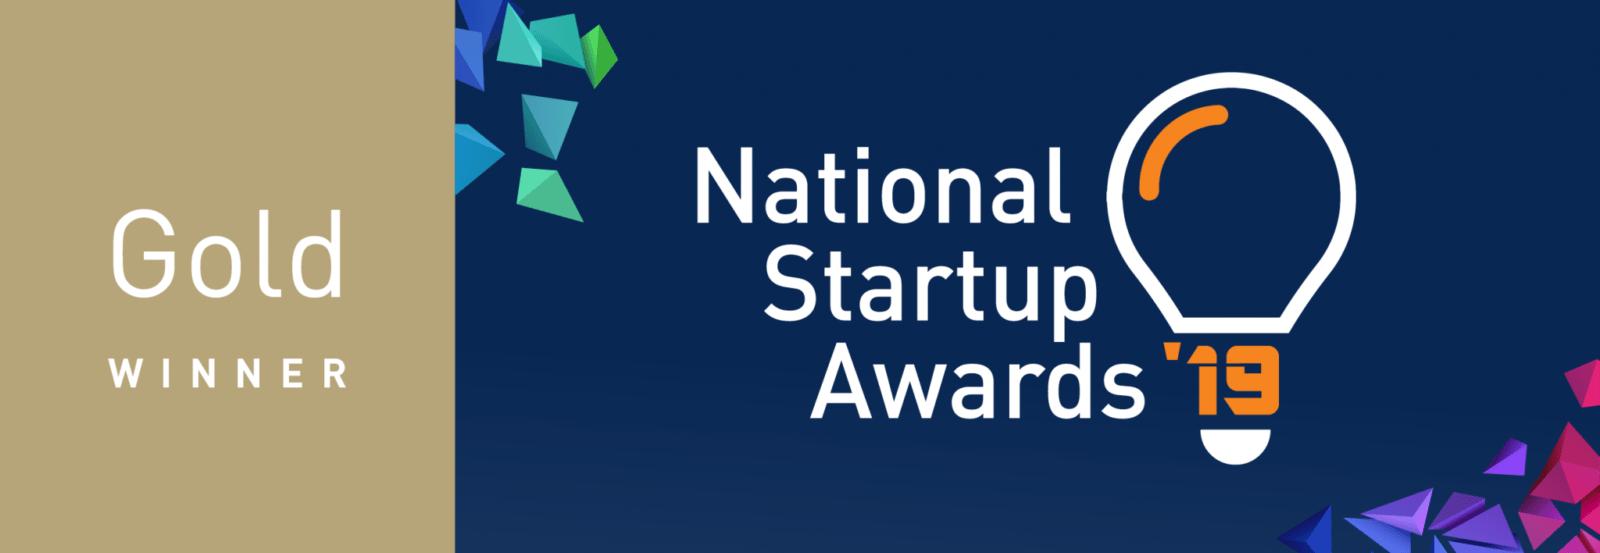 Gold winner of the National Startup Awards 2019